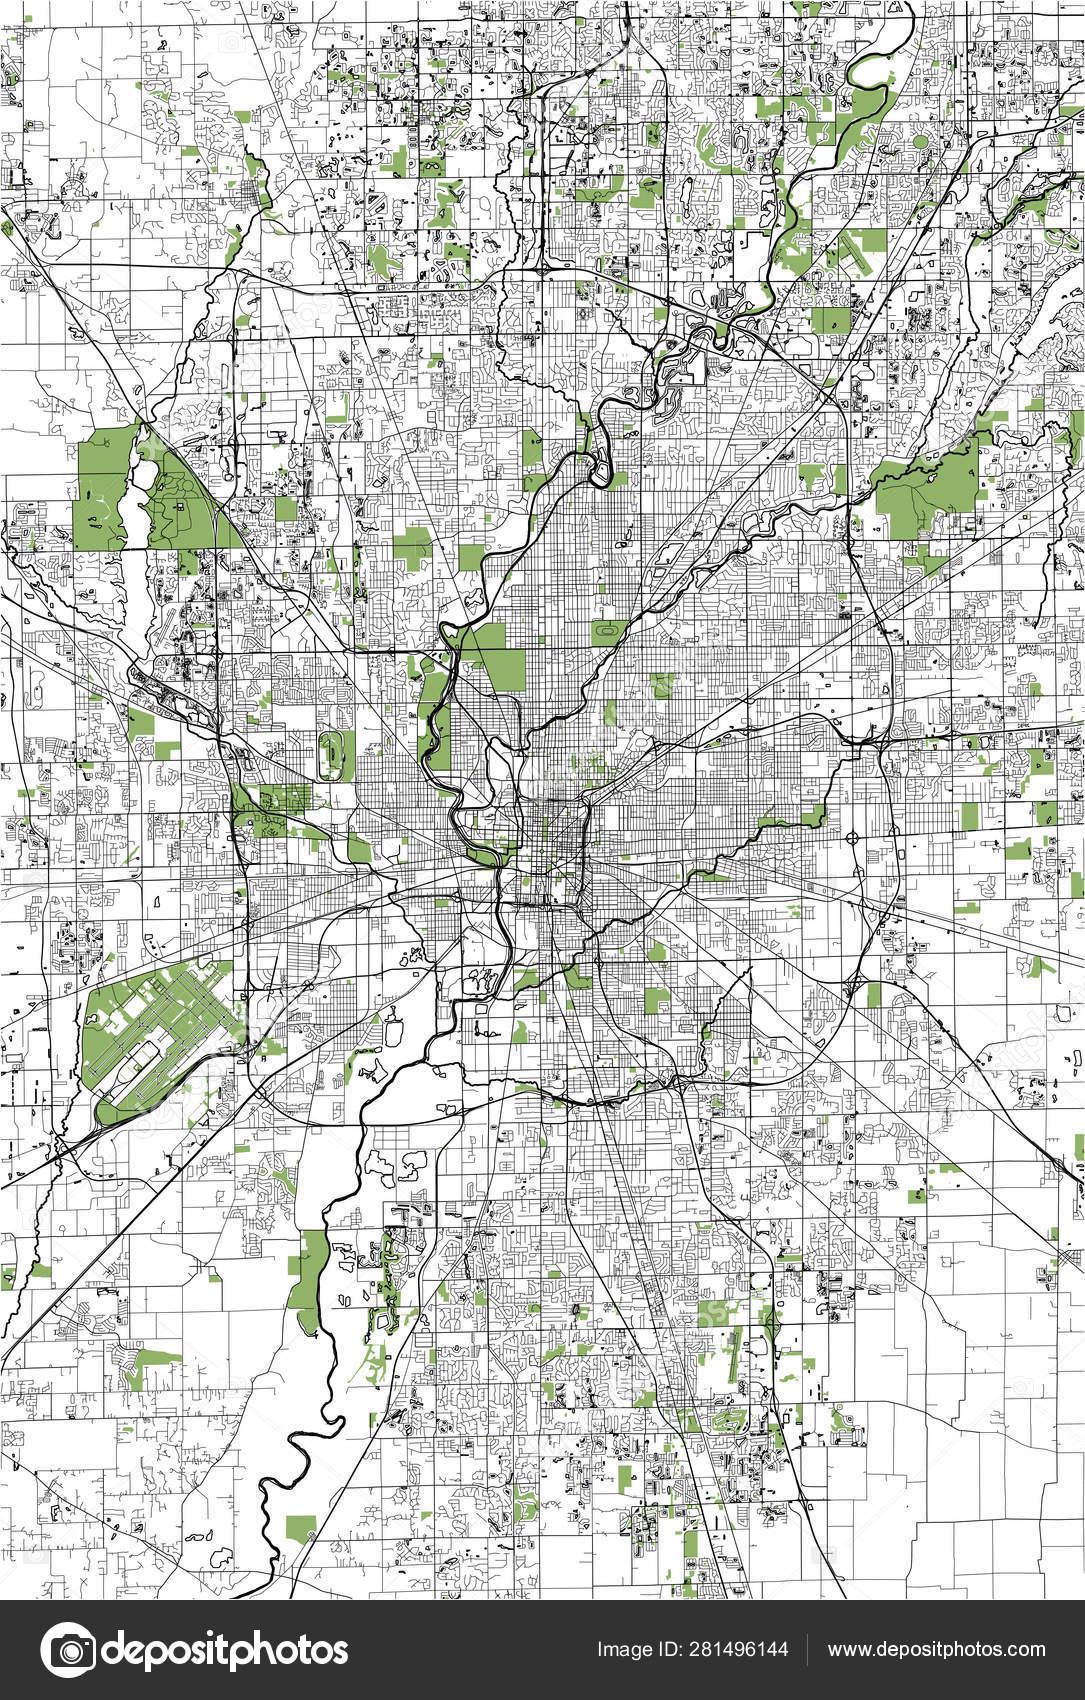 Map of the city of Indianapolis, Indiana, USA — Stock Vector ... Indianapolis Indiana Usa Map on usa map houston texas, usa map charlotte north carolina, usa map montgomery alabama, united states map indiana, road map of central indiana, usa map little rock arkansas, usa map austin texas, usa map norfolk virginia, street map of westfield indiana, american indiana, usa map louisville kentucky, usa map san antonio texas, us state map indiana, usa map memphis tennessee, usa map omaha nebraska, usa map atlanta georgia, usa map tucson arizona, the map of indiana, usa map lincoln nebraska, usa map tulsa oklahoma,